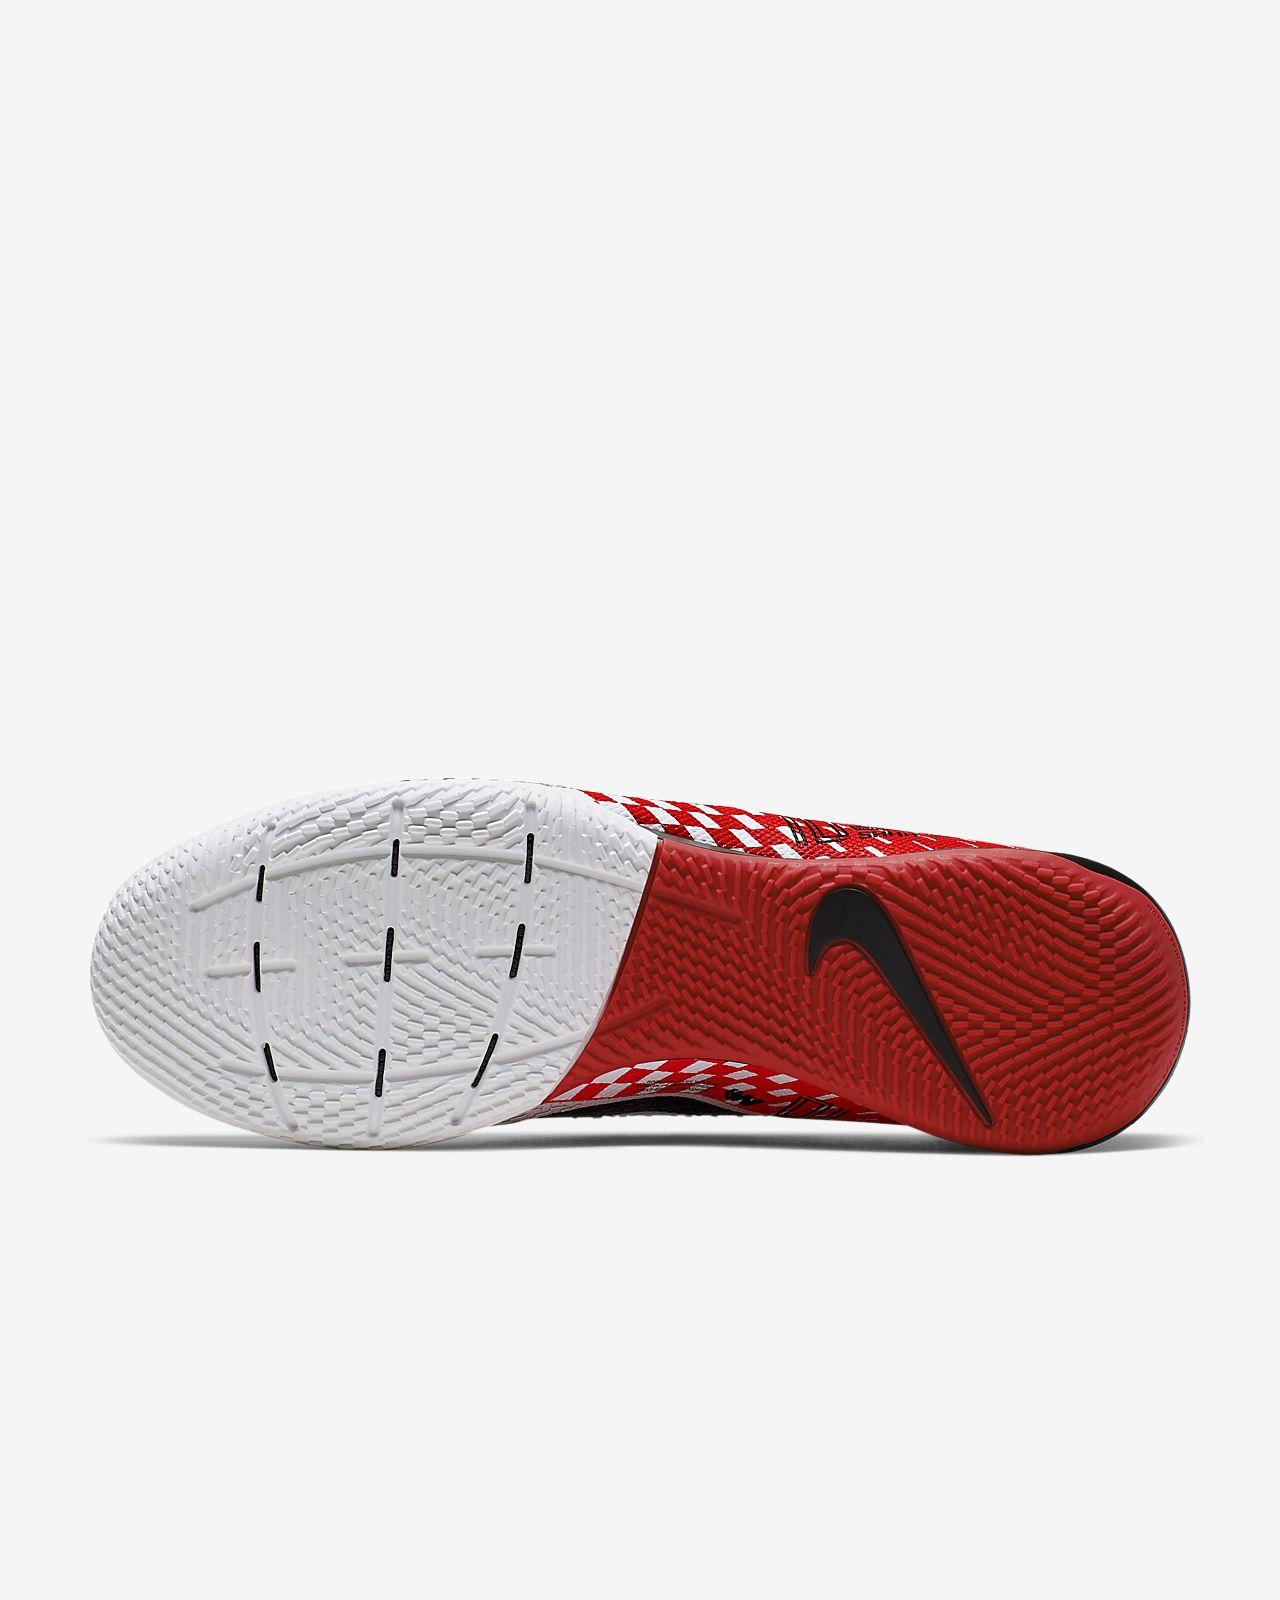 indoorcemento Neymar campo Nike Mercurial Vapor Pro 13